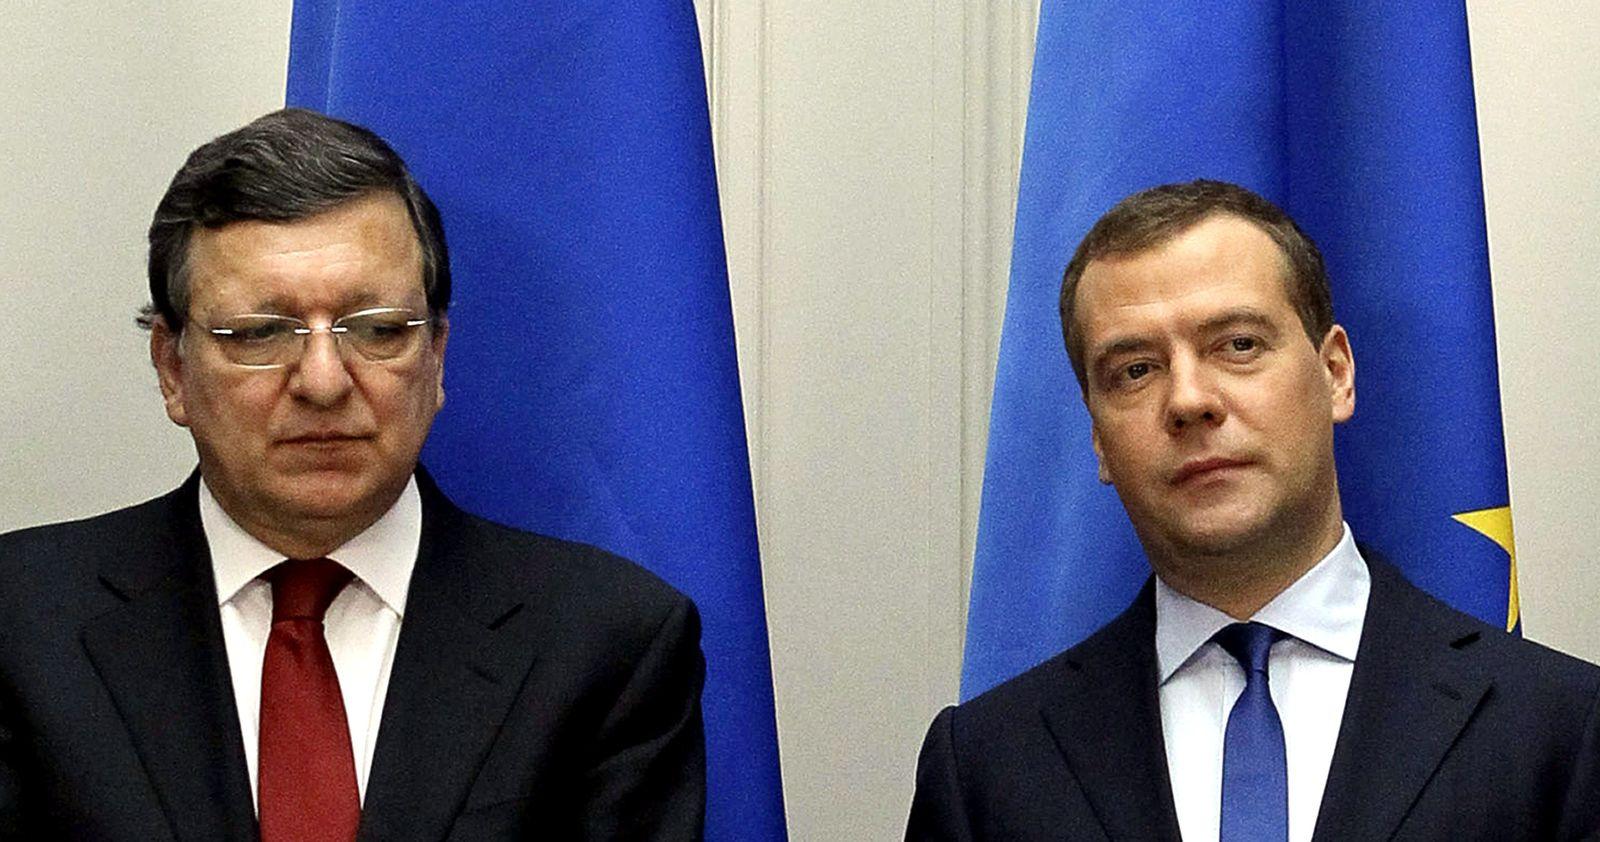 Dimitrij Medwedew / Barroso